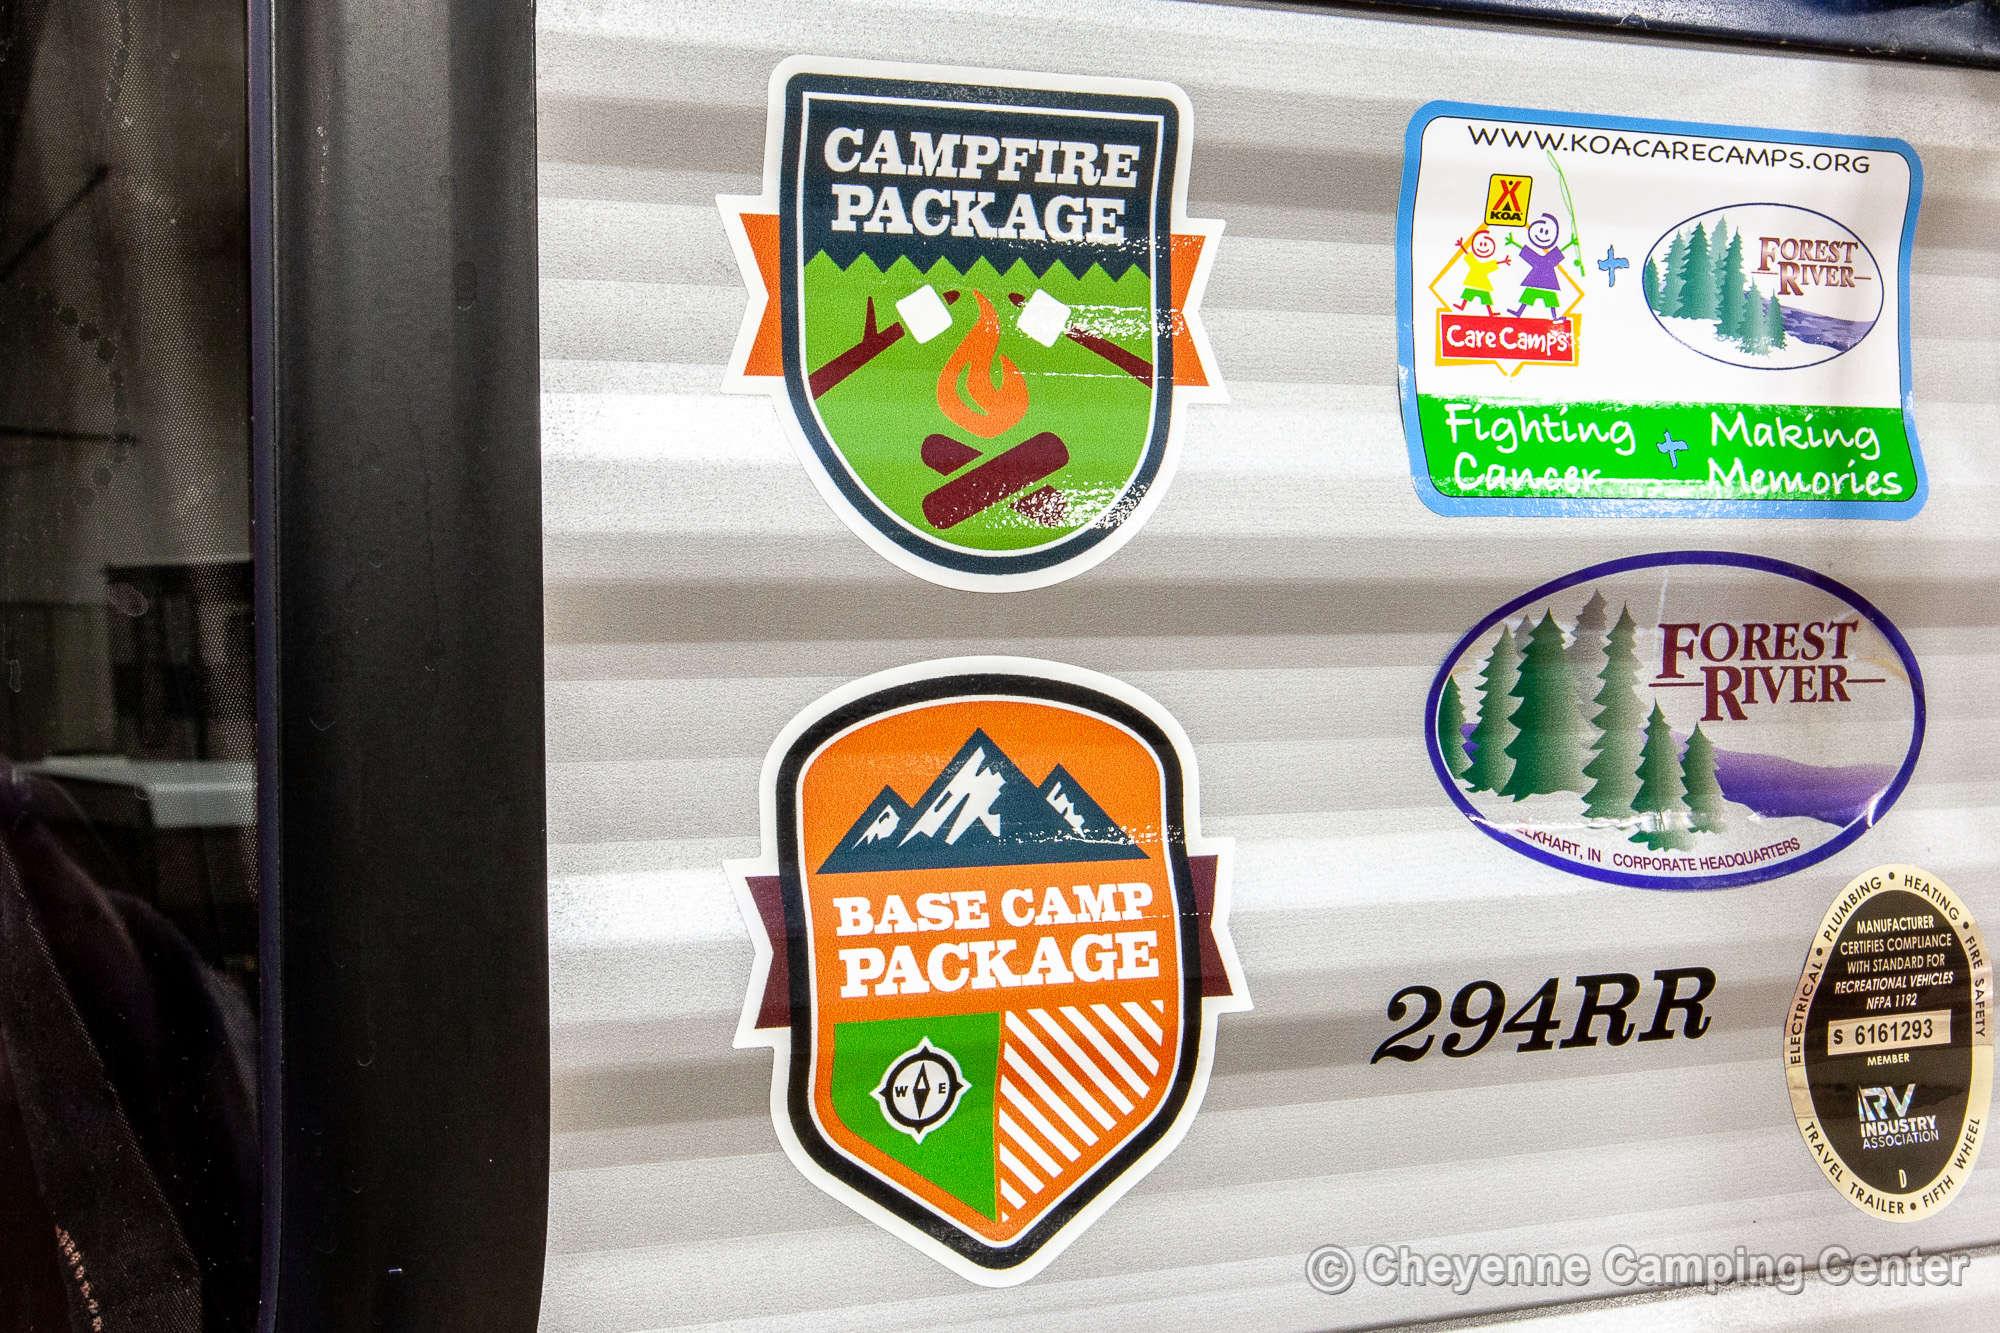 2021 Forest River Cherokee 294RR Toy Hauler Travel Trailer Exterior Image